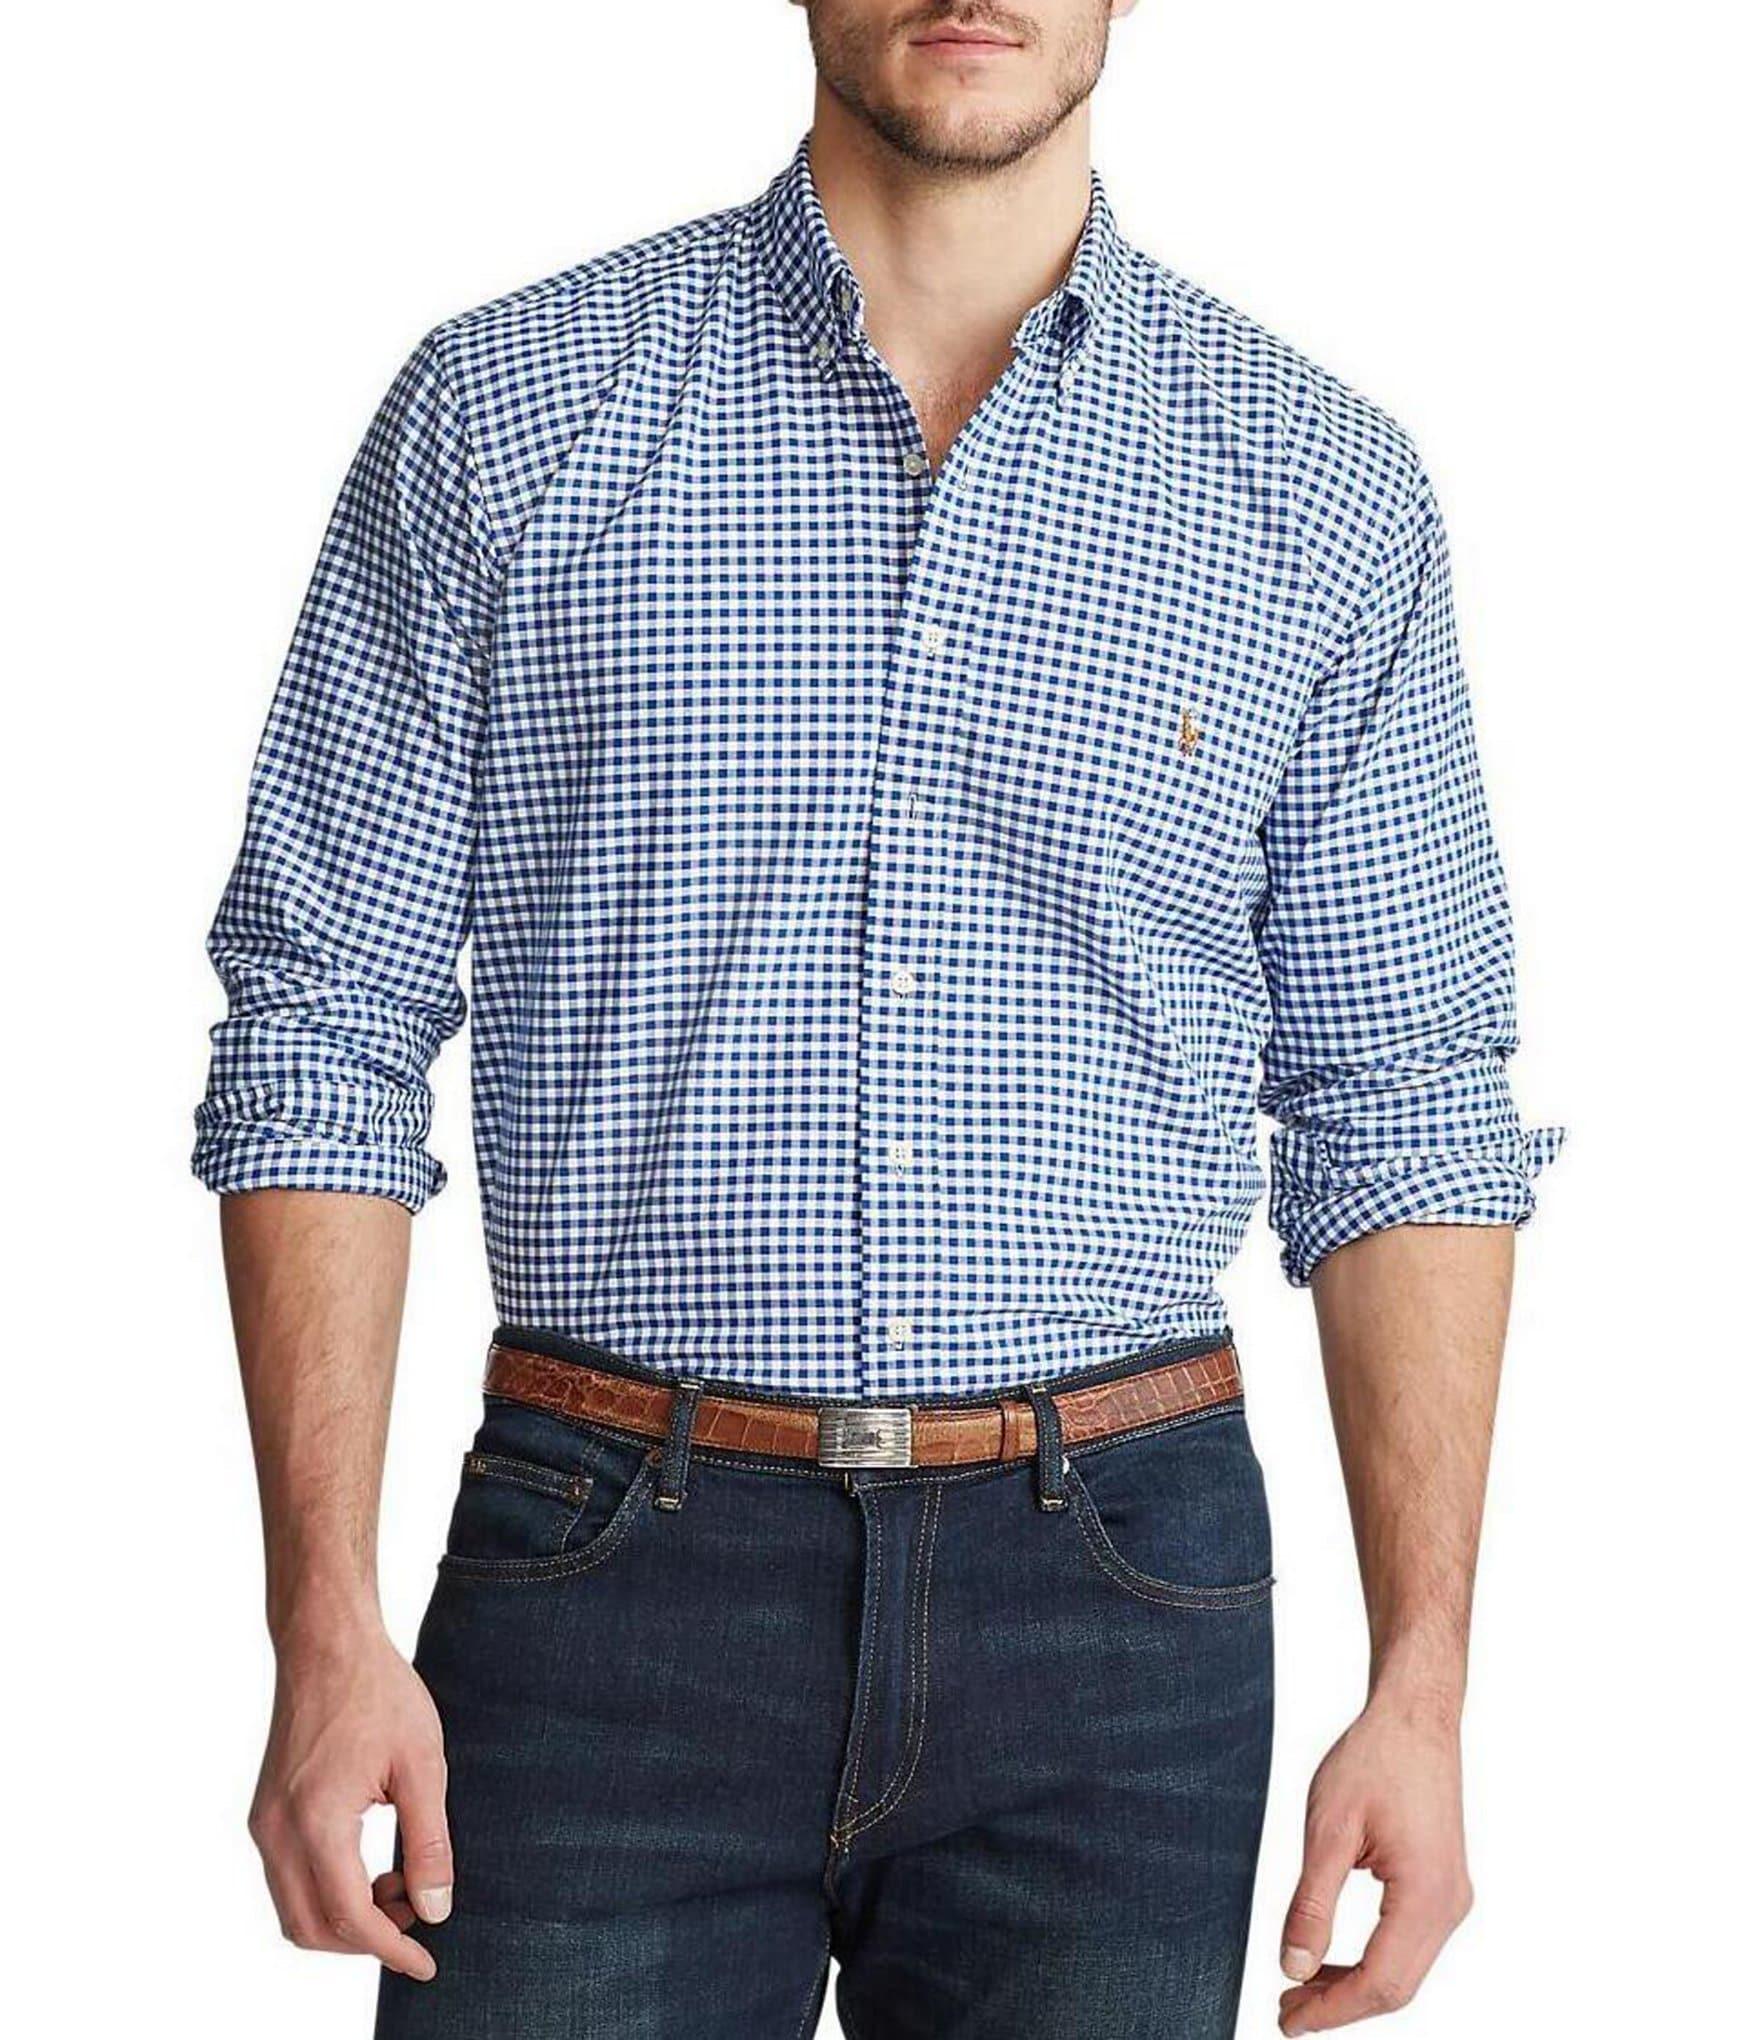 Polo Ralph Lauren Big Tall Checked Oxford Shirt Dillards